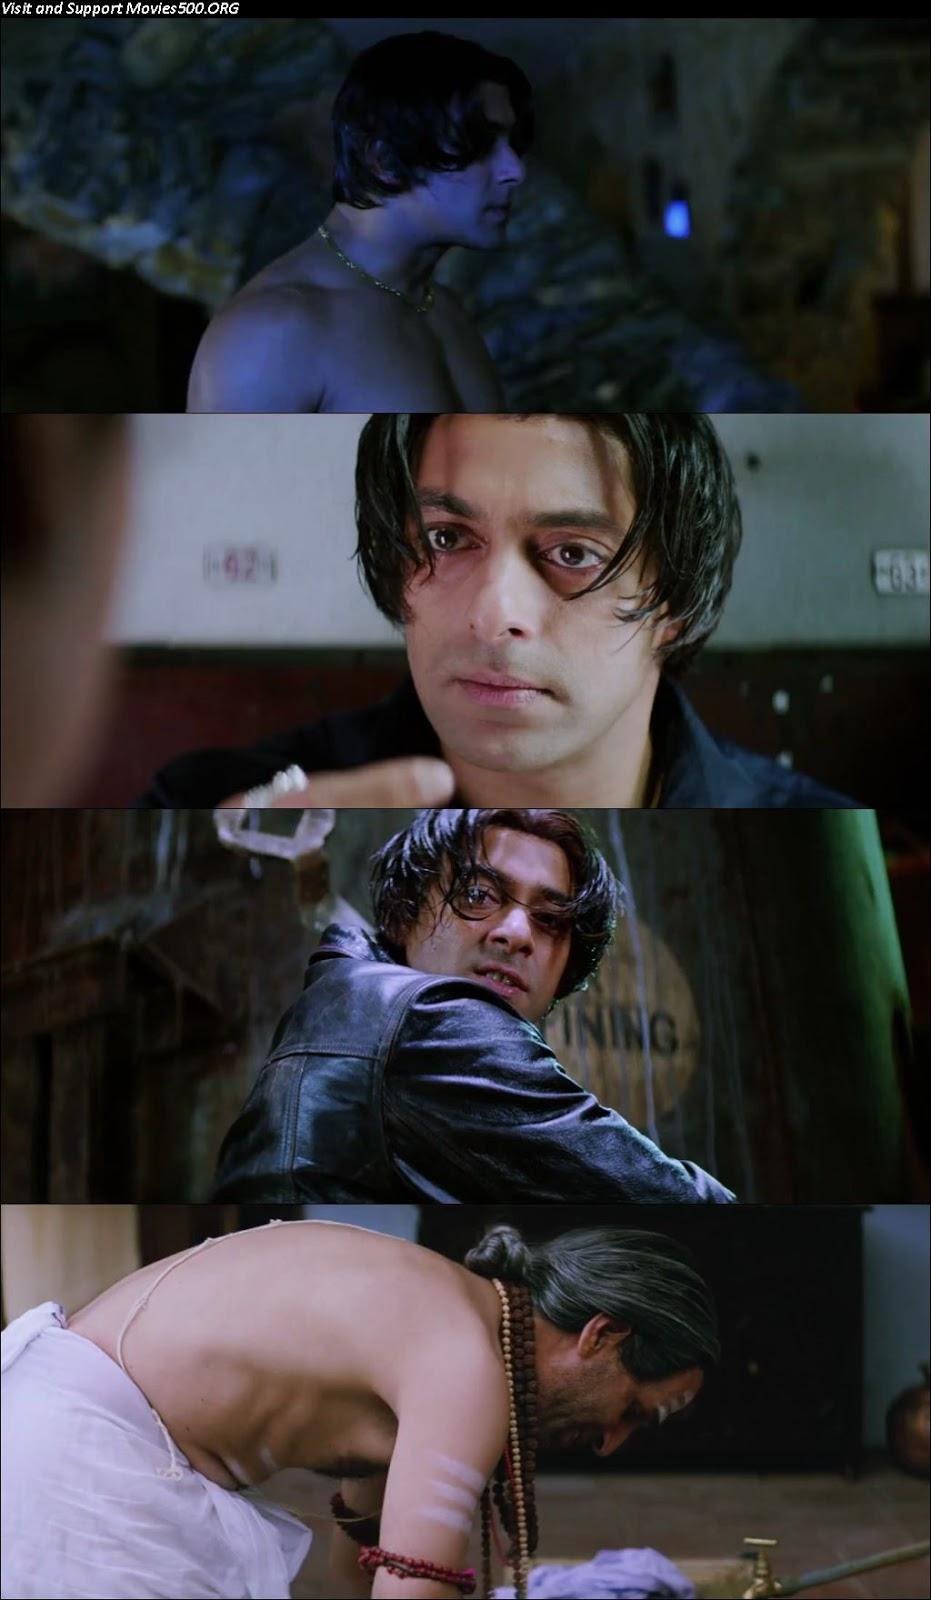 Tere Naam 2003 Hindi Movie Download BluRay 720P 1Gb at oprbnwjgcljzw.com